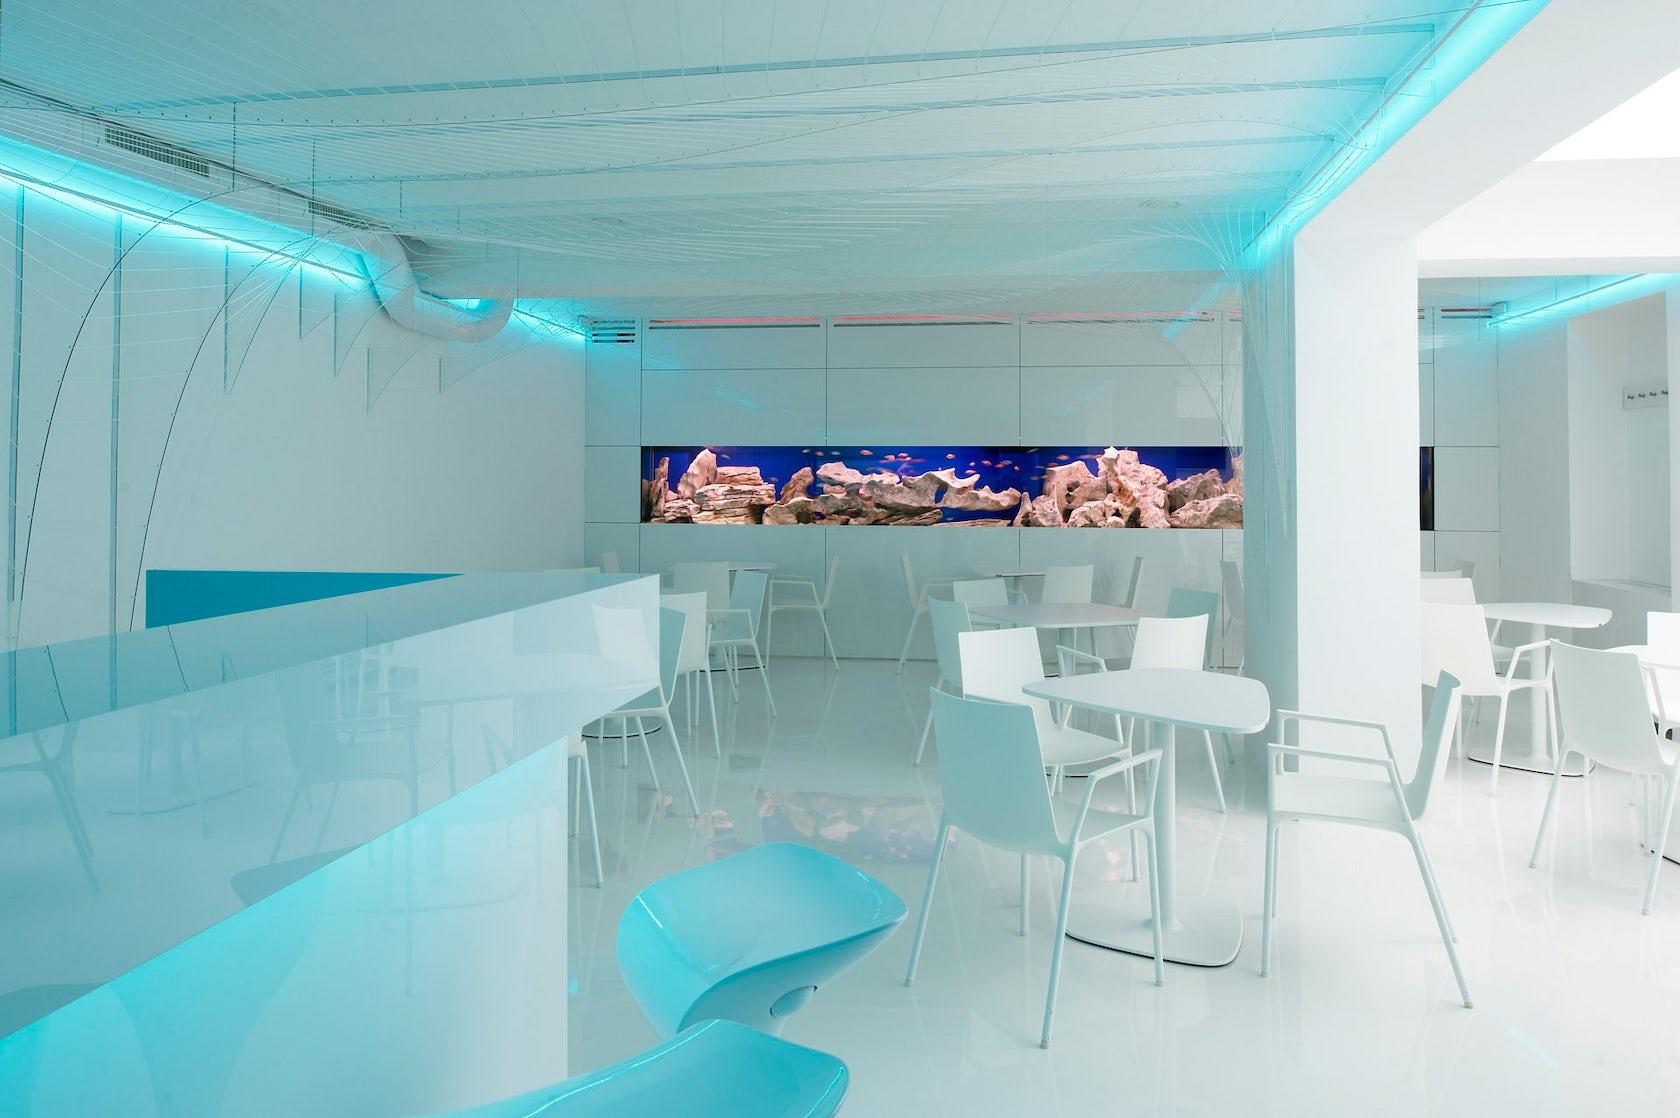 bar aquarium architizer. Black Bedroom Furniture Sets. Home Design Ideas